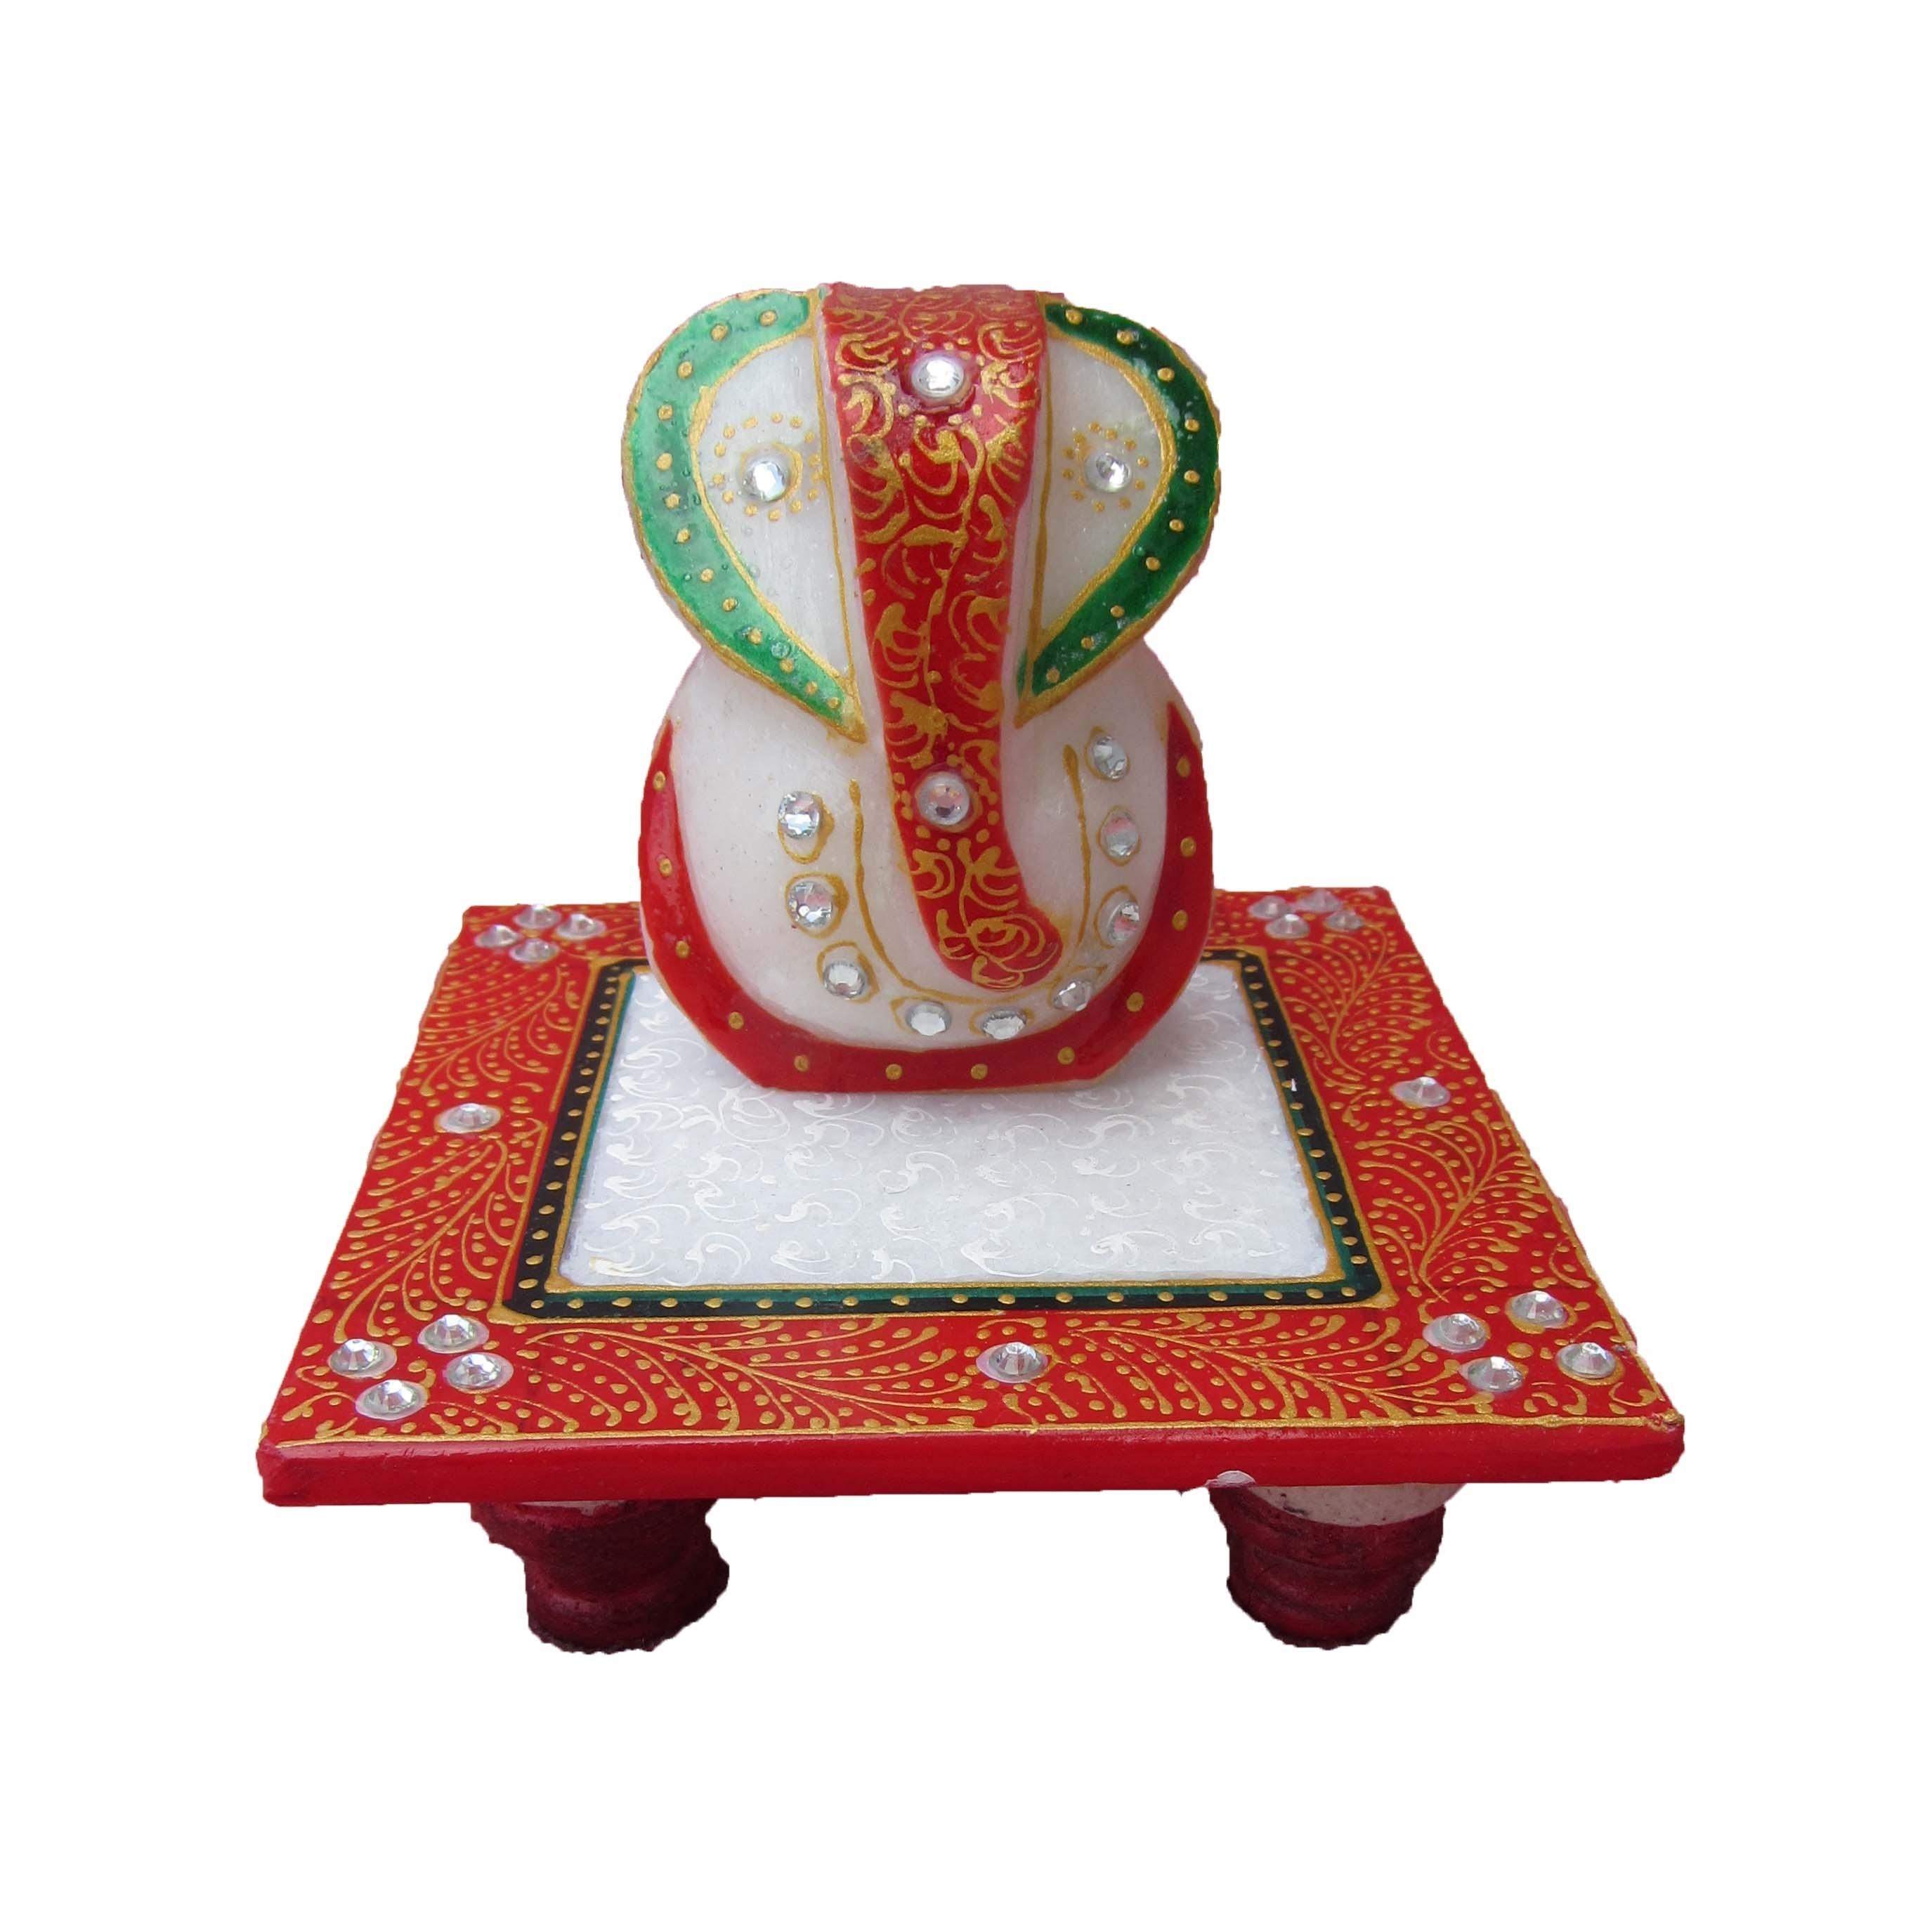 Lord Ganesha on Red Marble Chowki Indian Home Decor